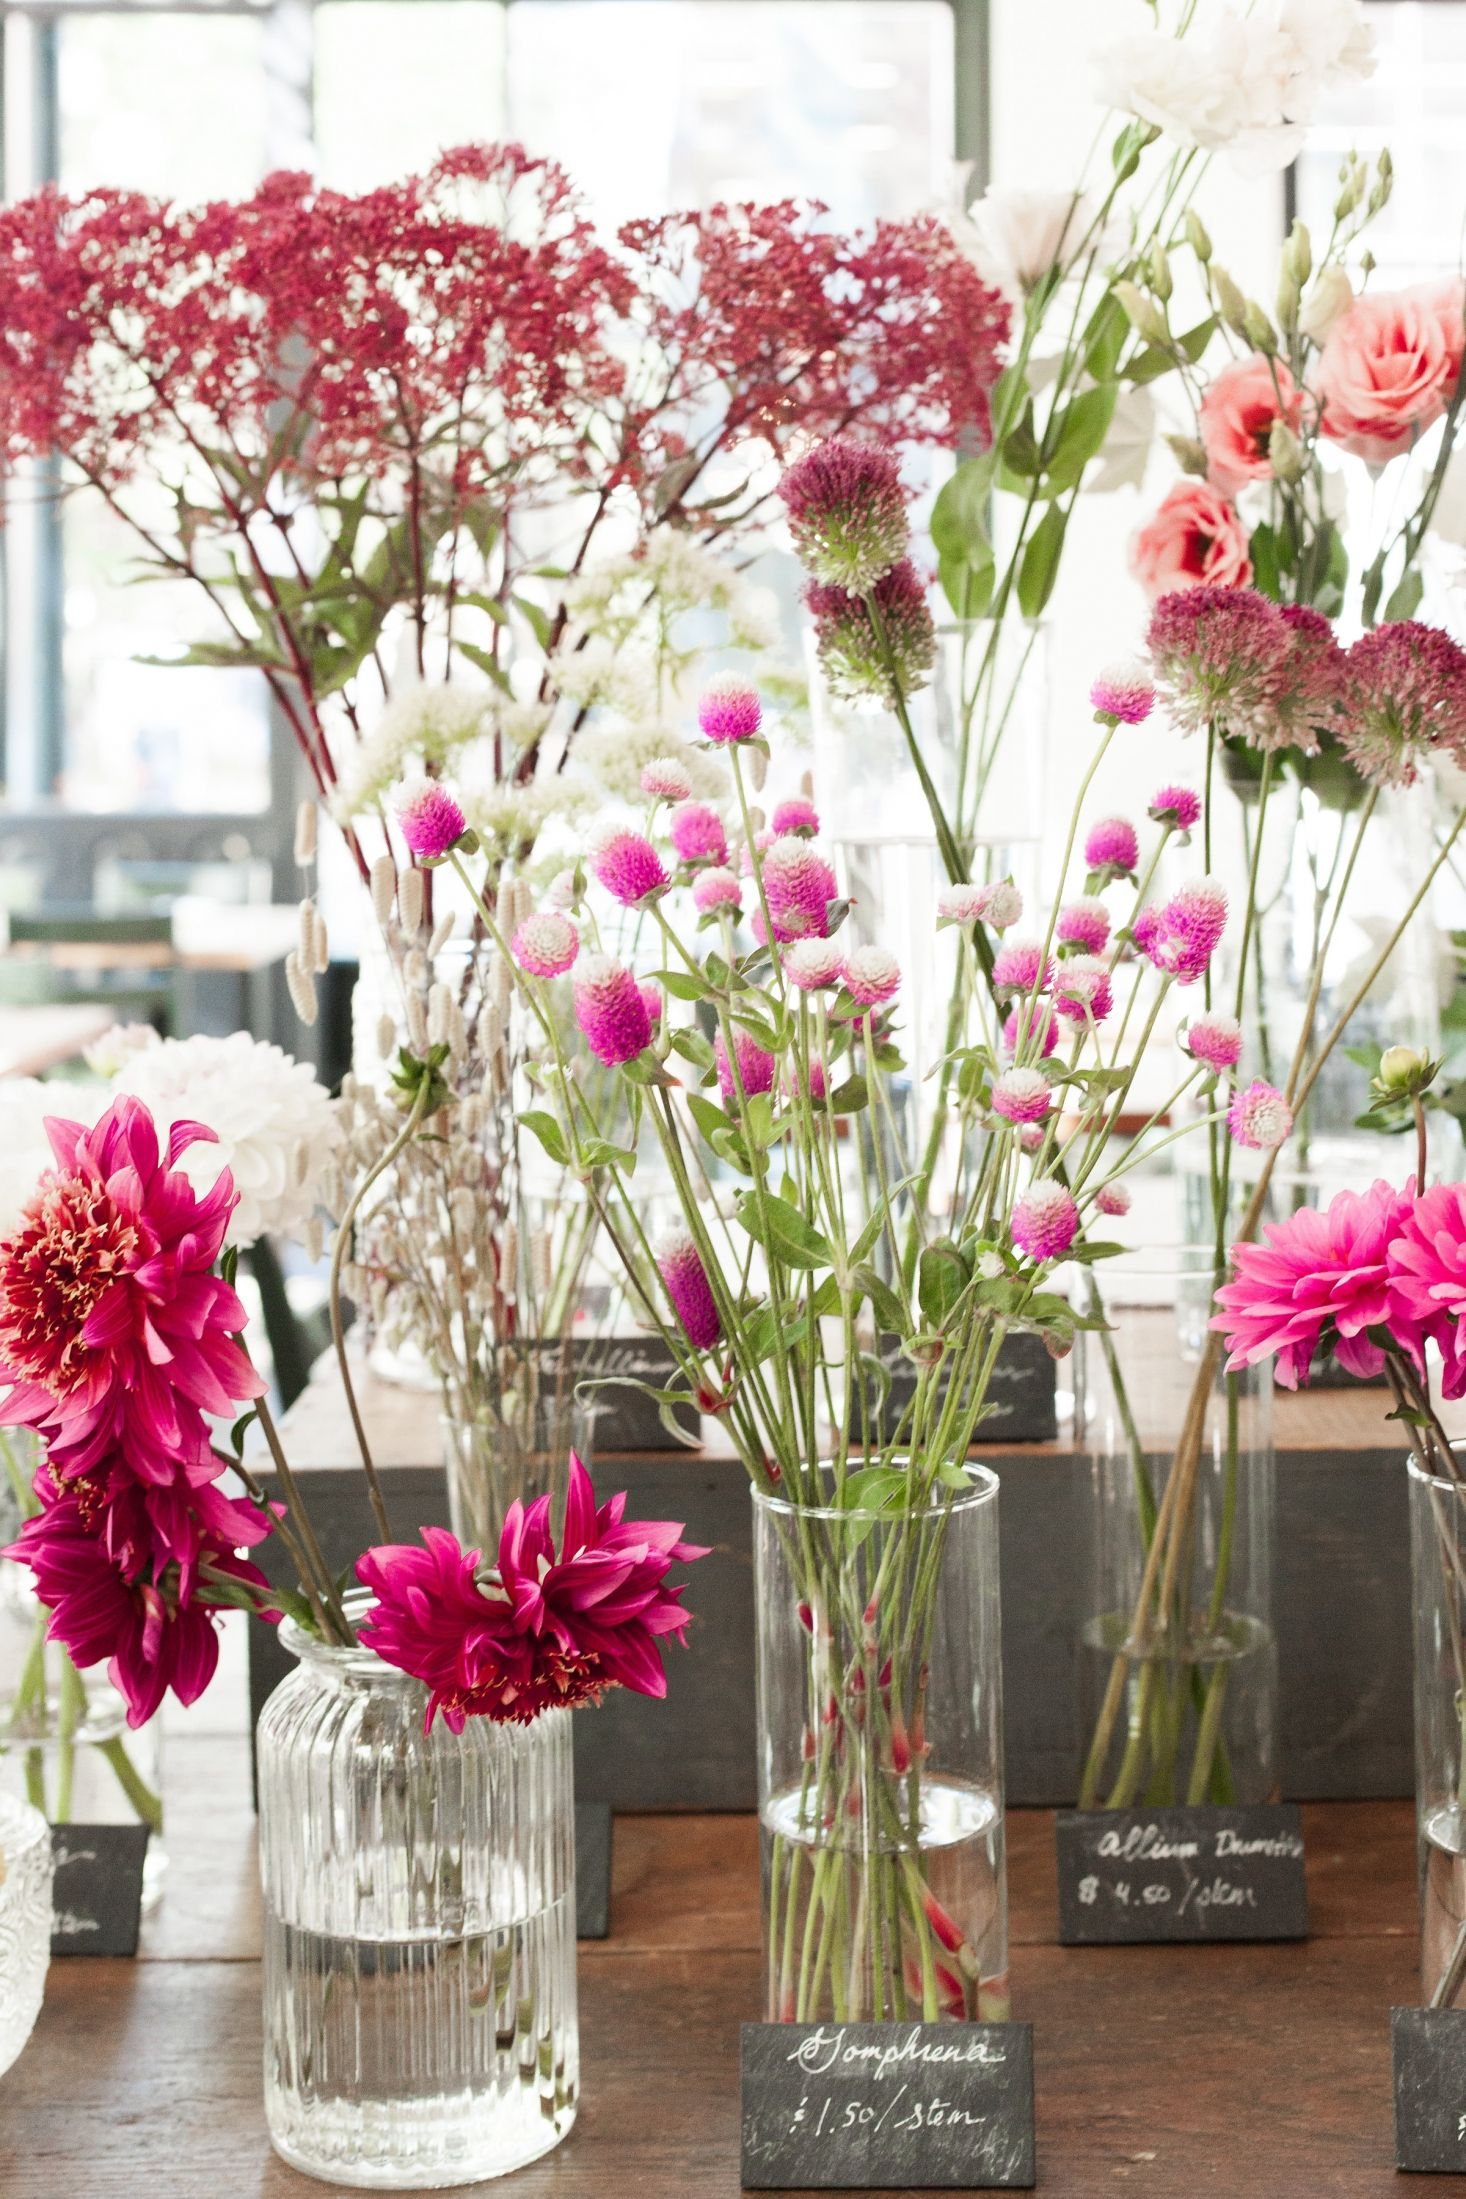 The Flower Shop at Seattle's London Plane Gardenista